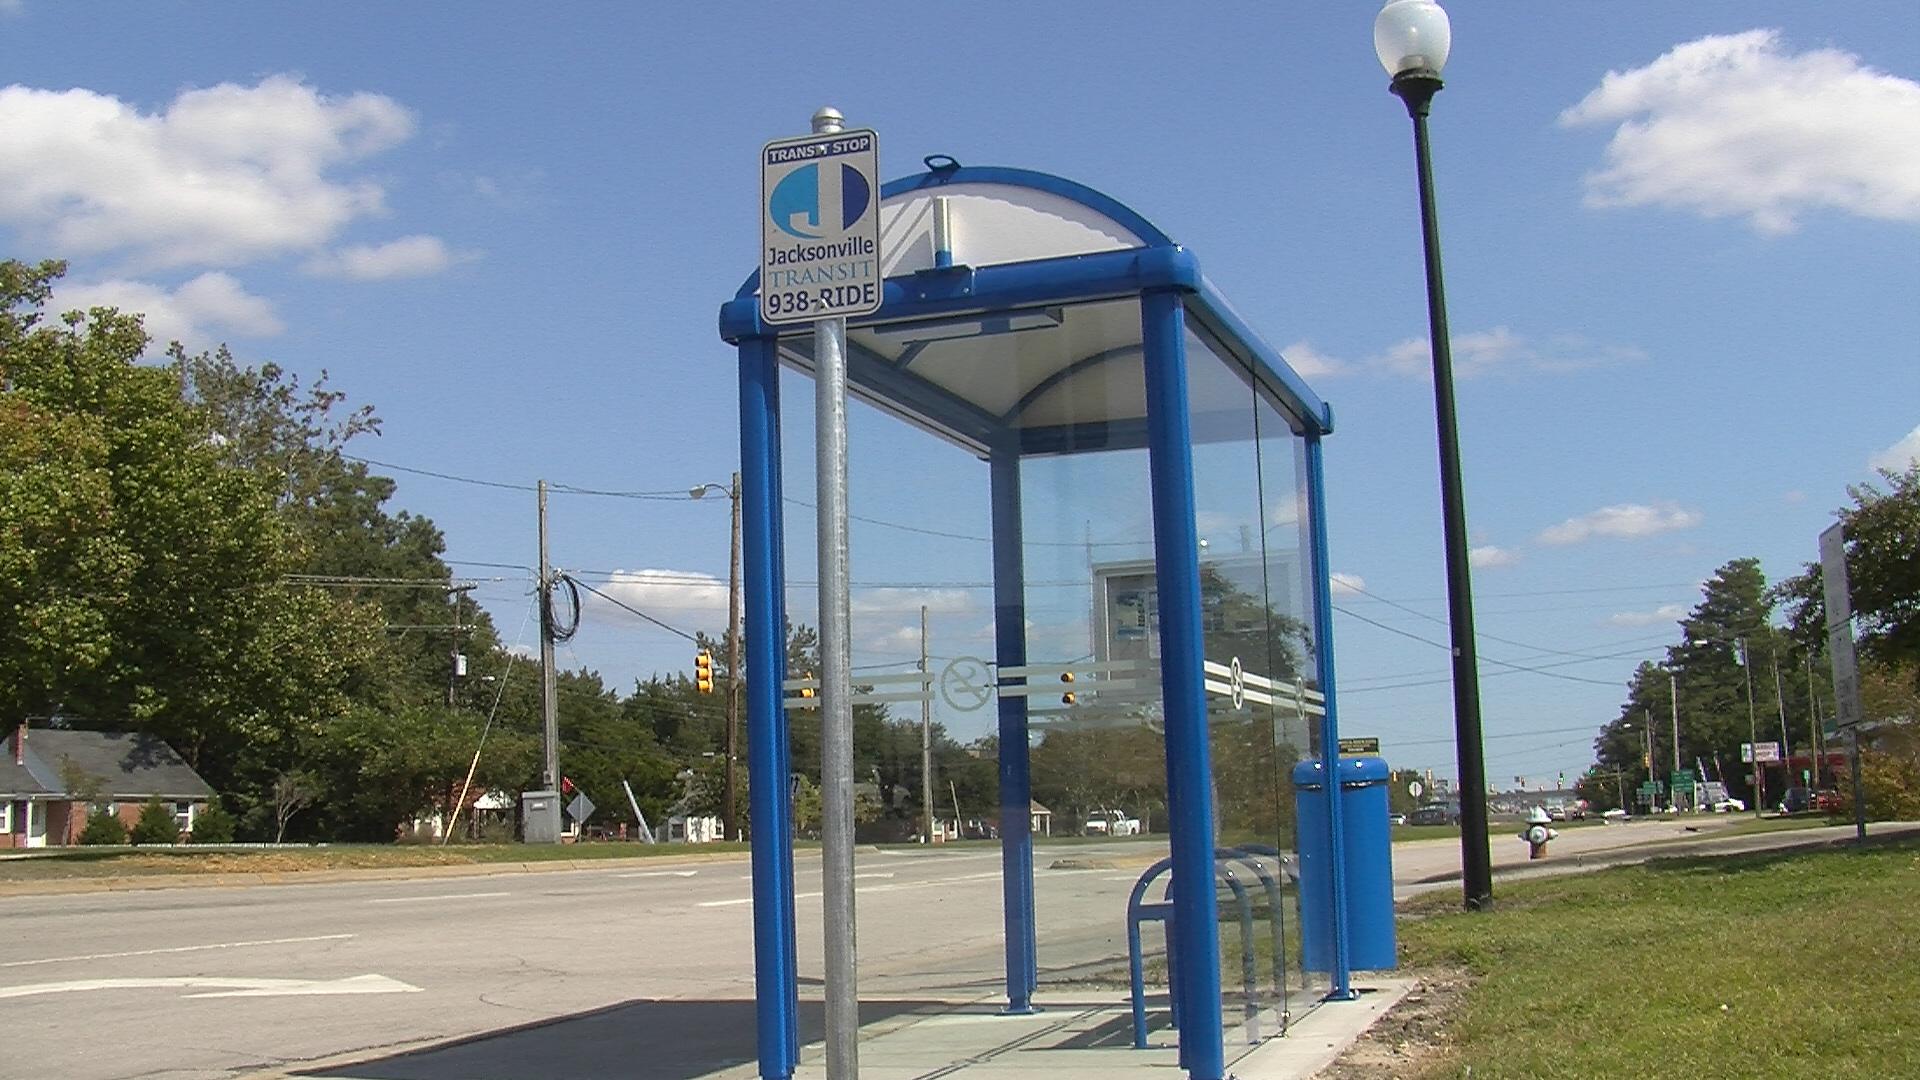 Jacksonville Transit stop